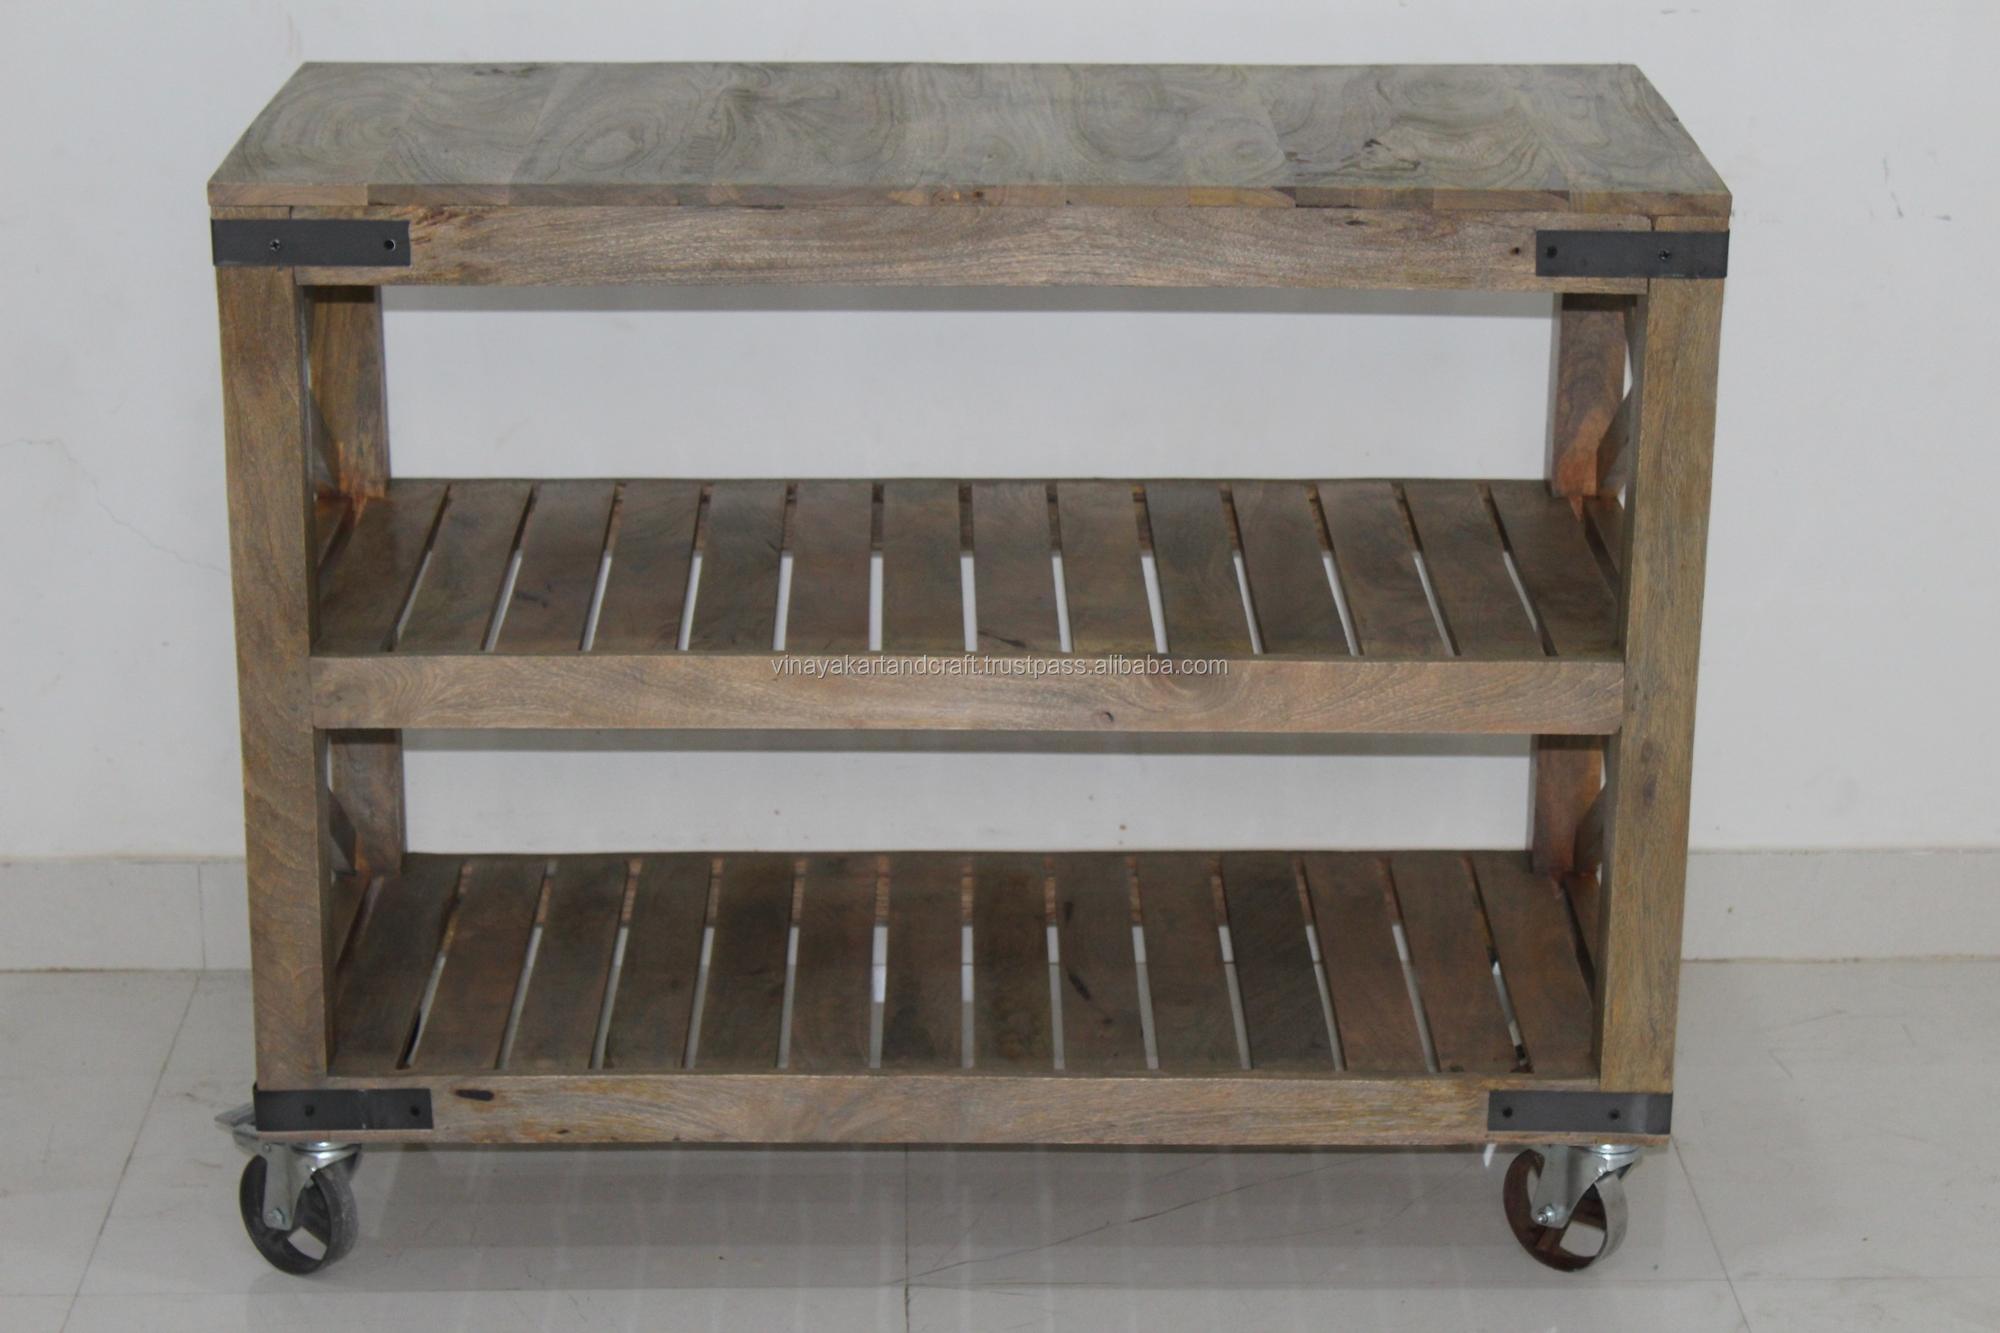 vintage industrial kitchen cart